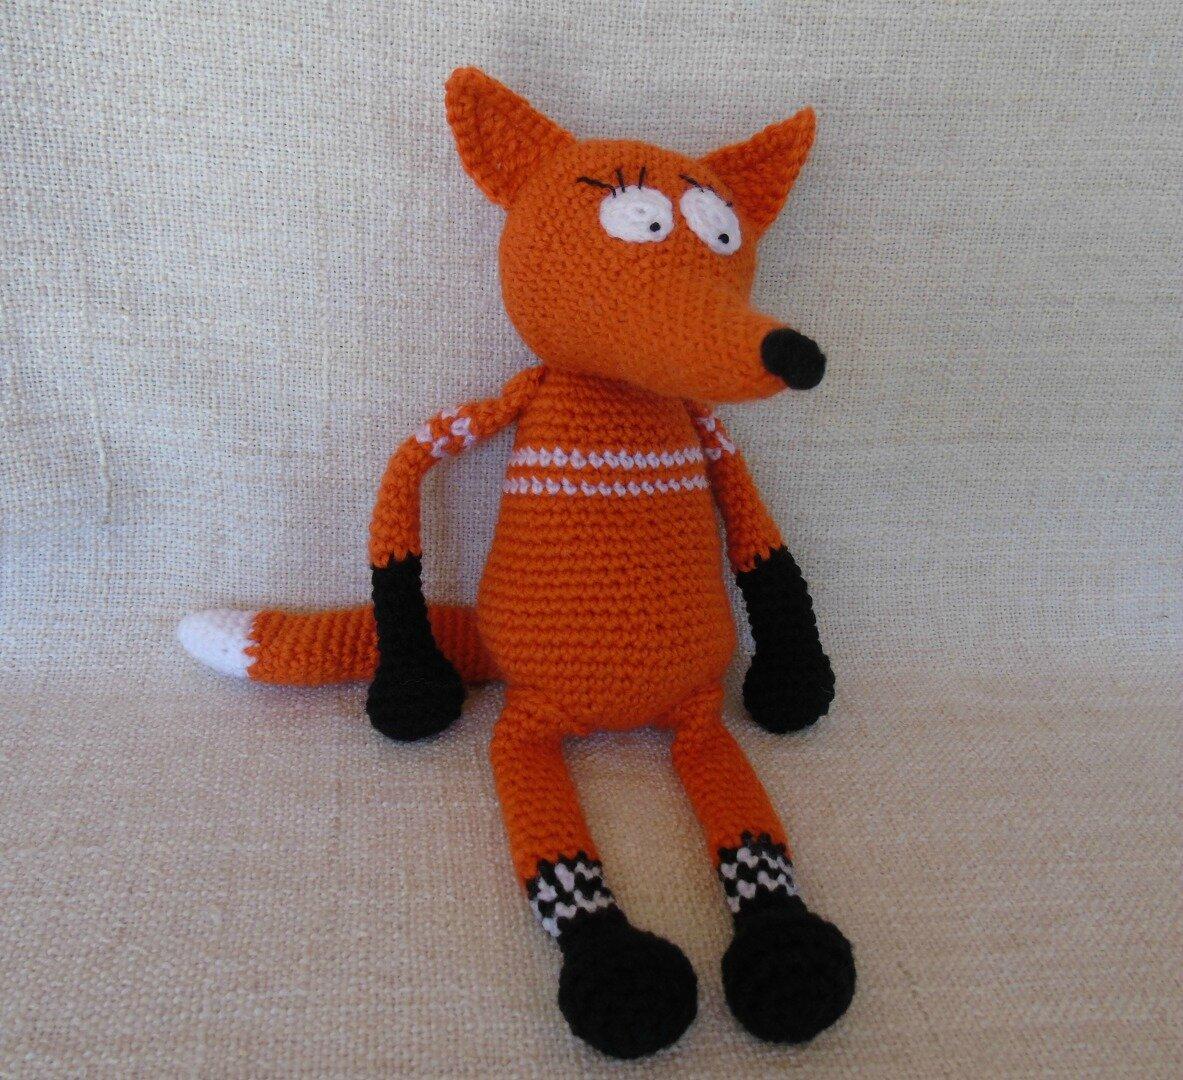 renard-au-crochet-cils-assisface